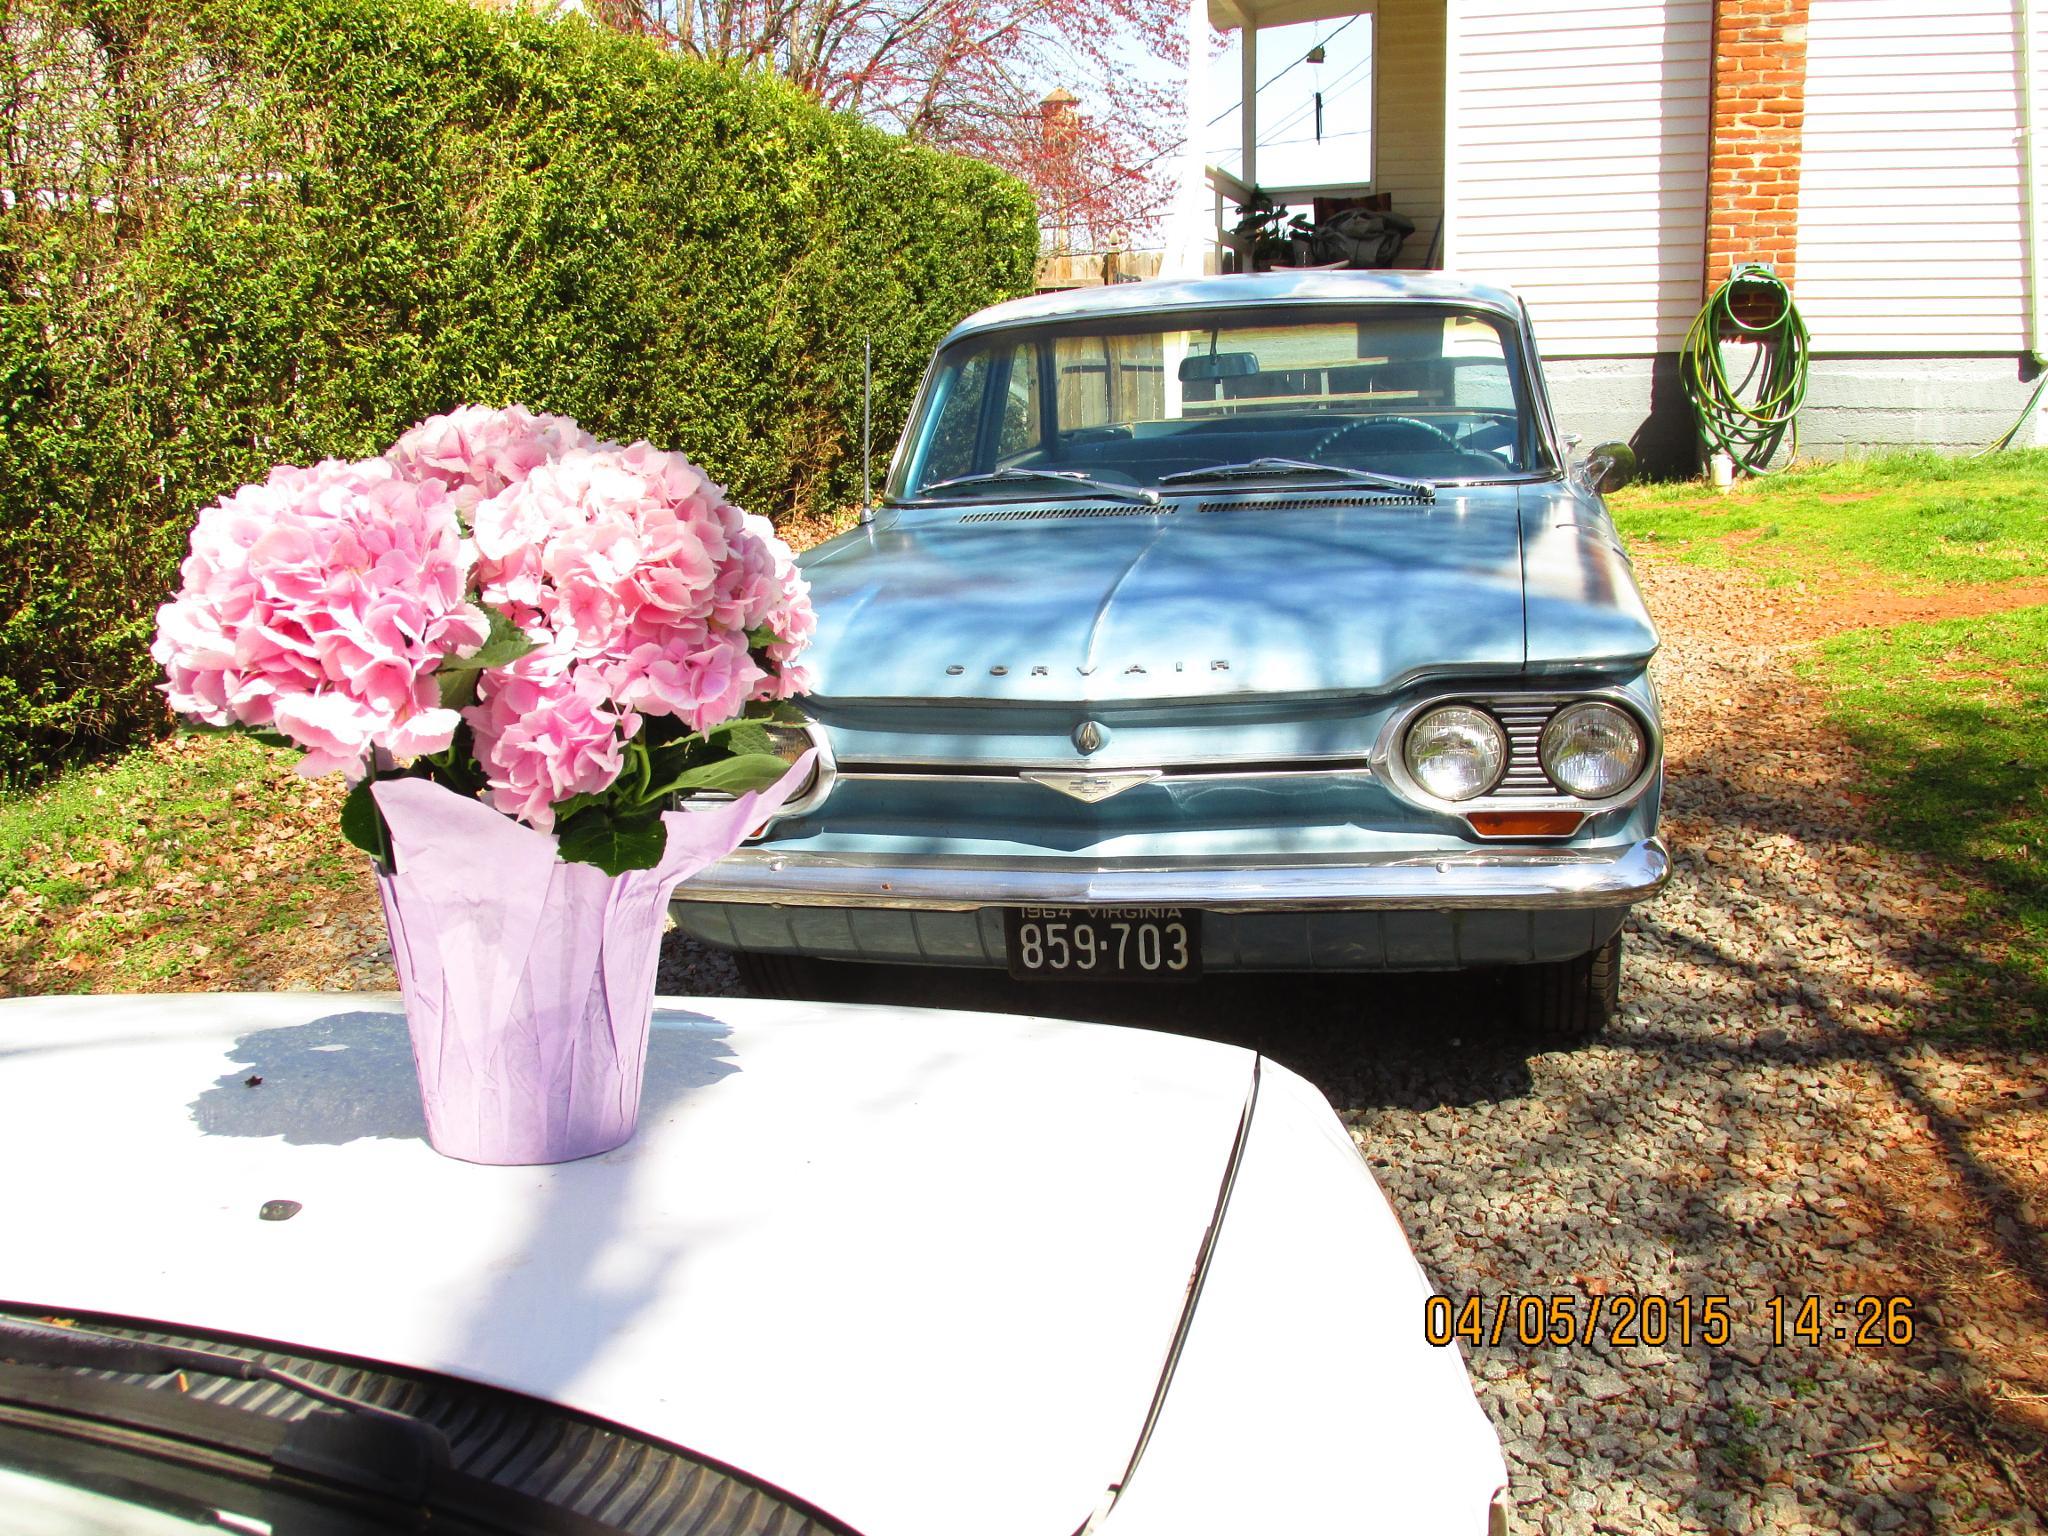 Hydrangea and movie star car by bj.ameyguckert